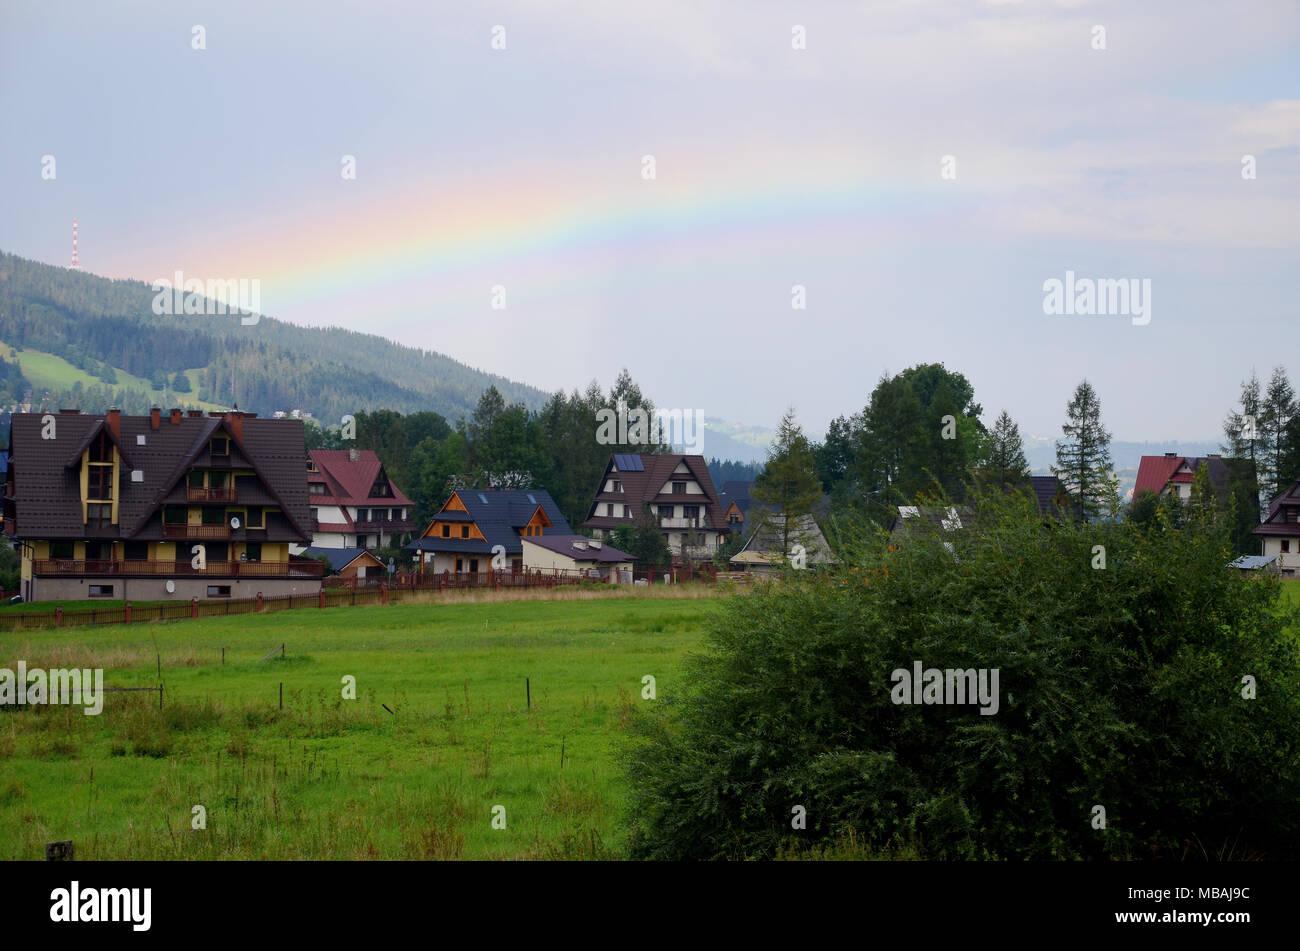 Rainbow - Tatra Mountains in Poland - Stock Image